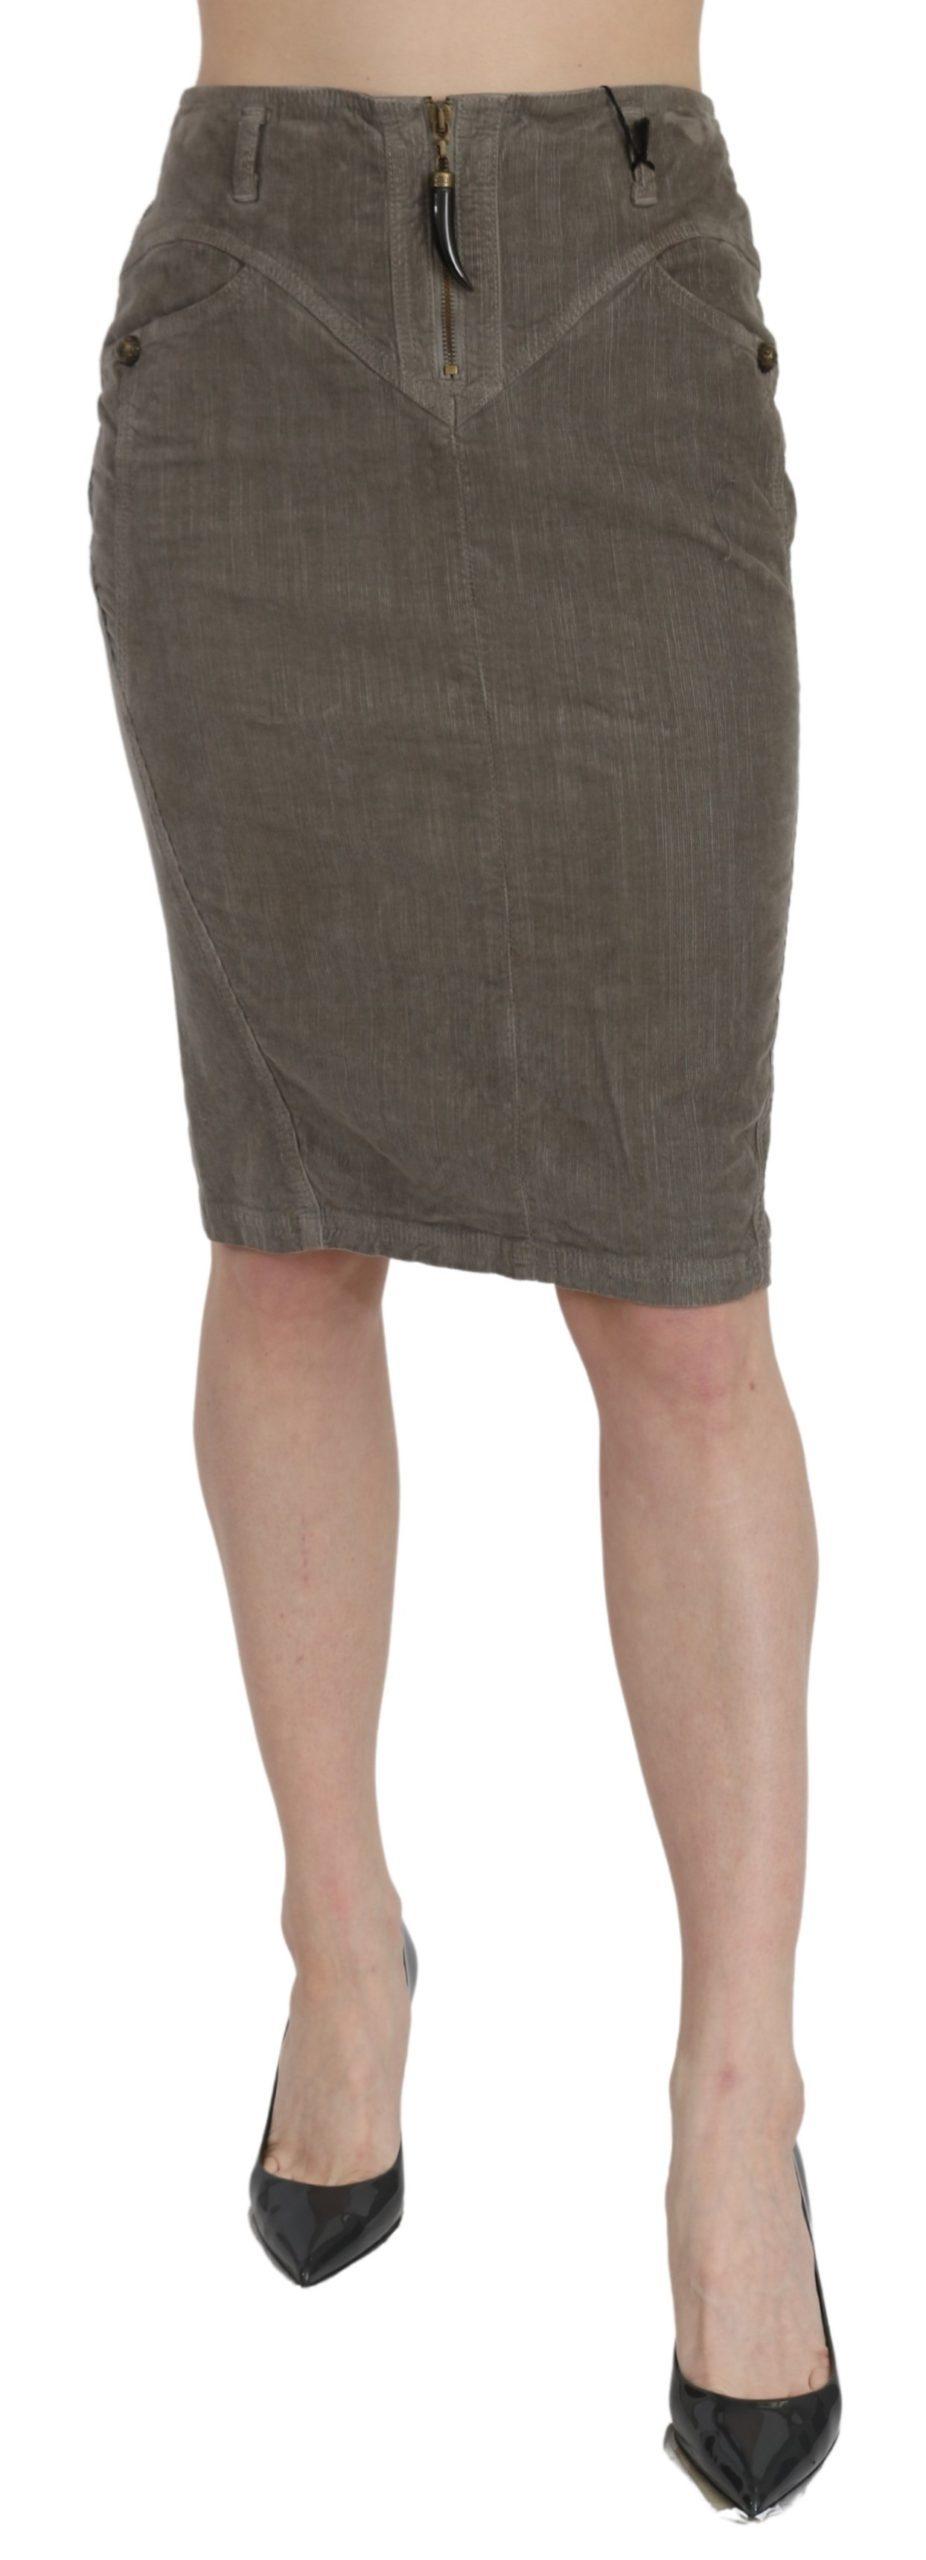 Roberto Cavalli Women's High Waist Pencil Skirt Gray PAN70988 - IT44|L